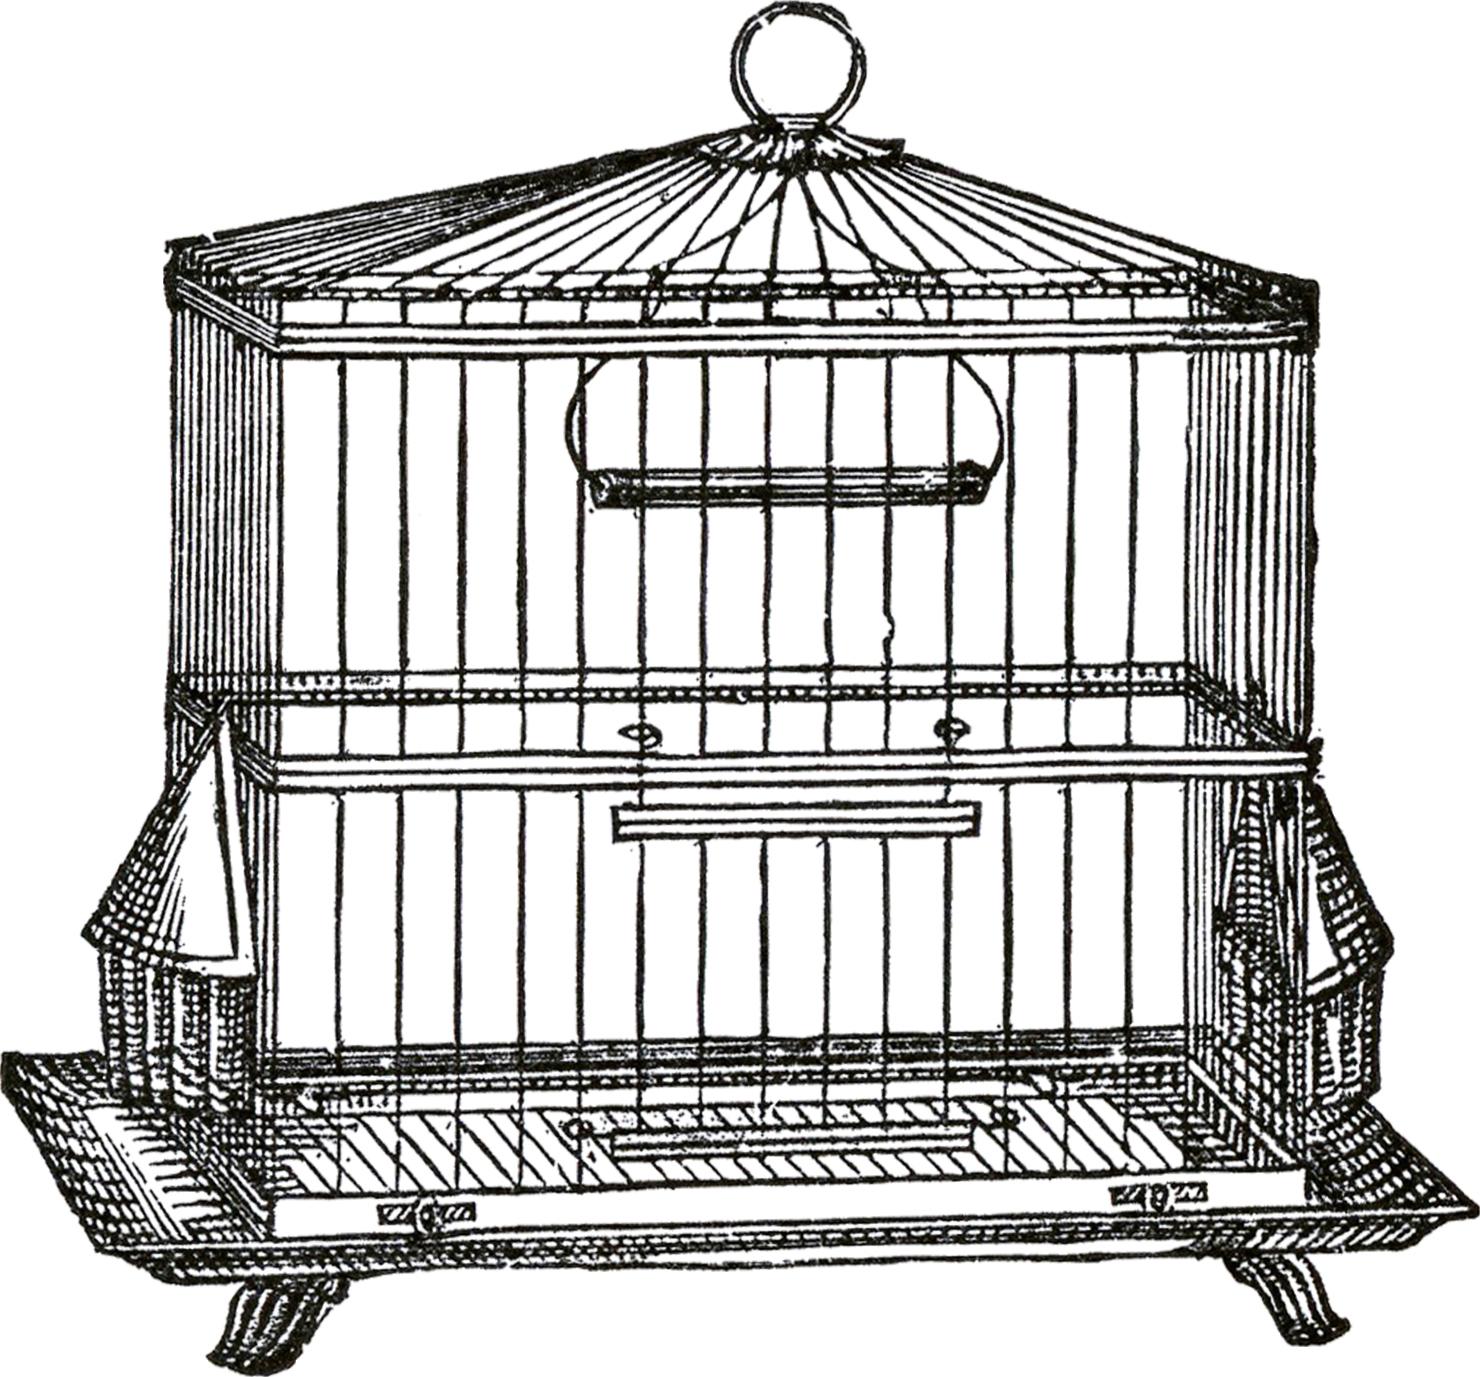 Graphics fairy birdcage trans. Cage clipart transparent background